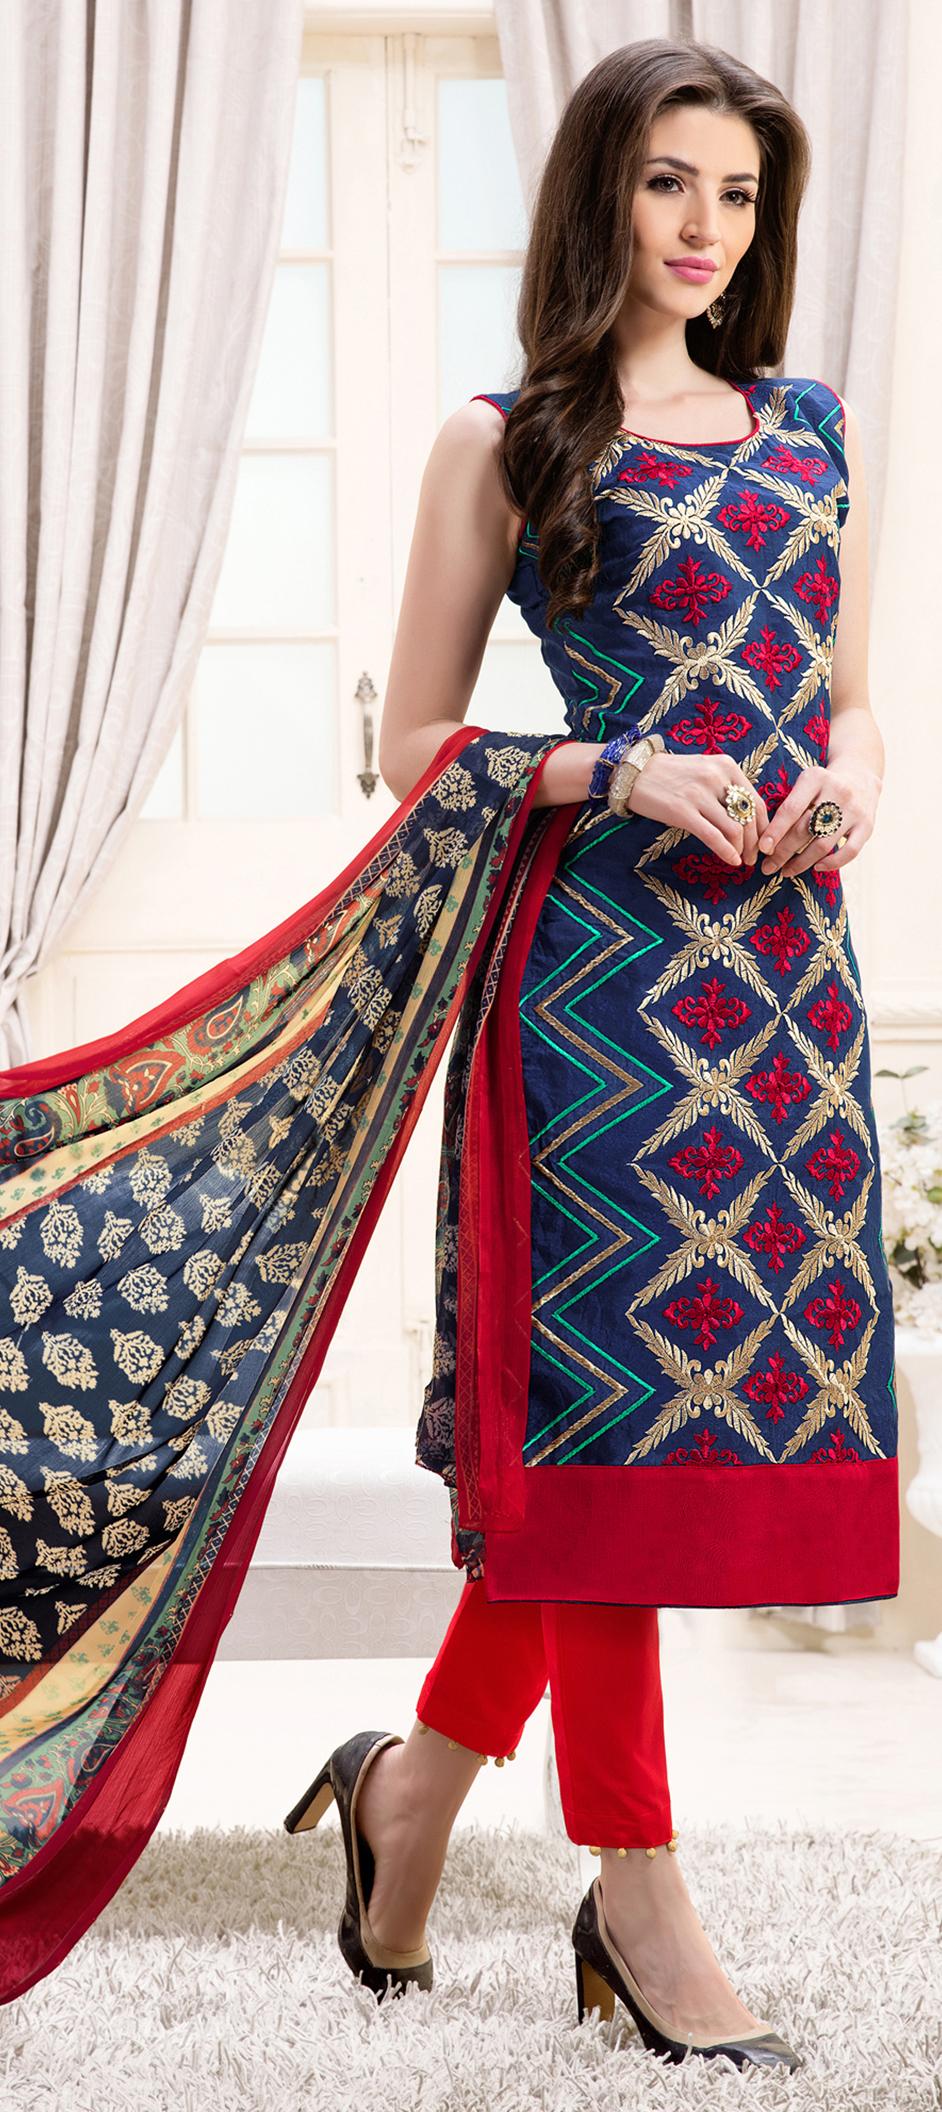 466904: Blue color family semi-stiched Party Wear Salwar Kameez .